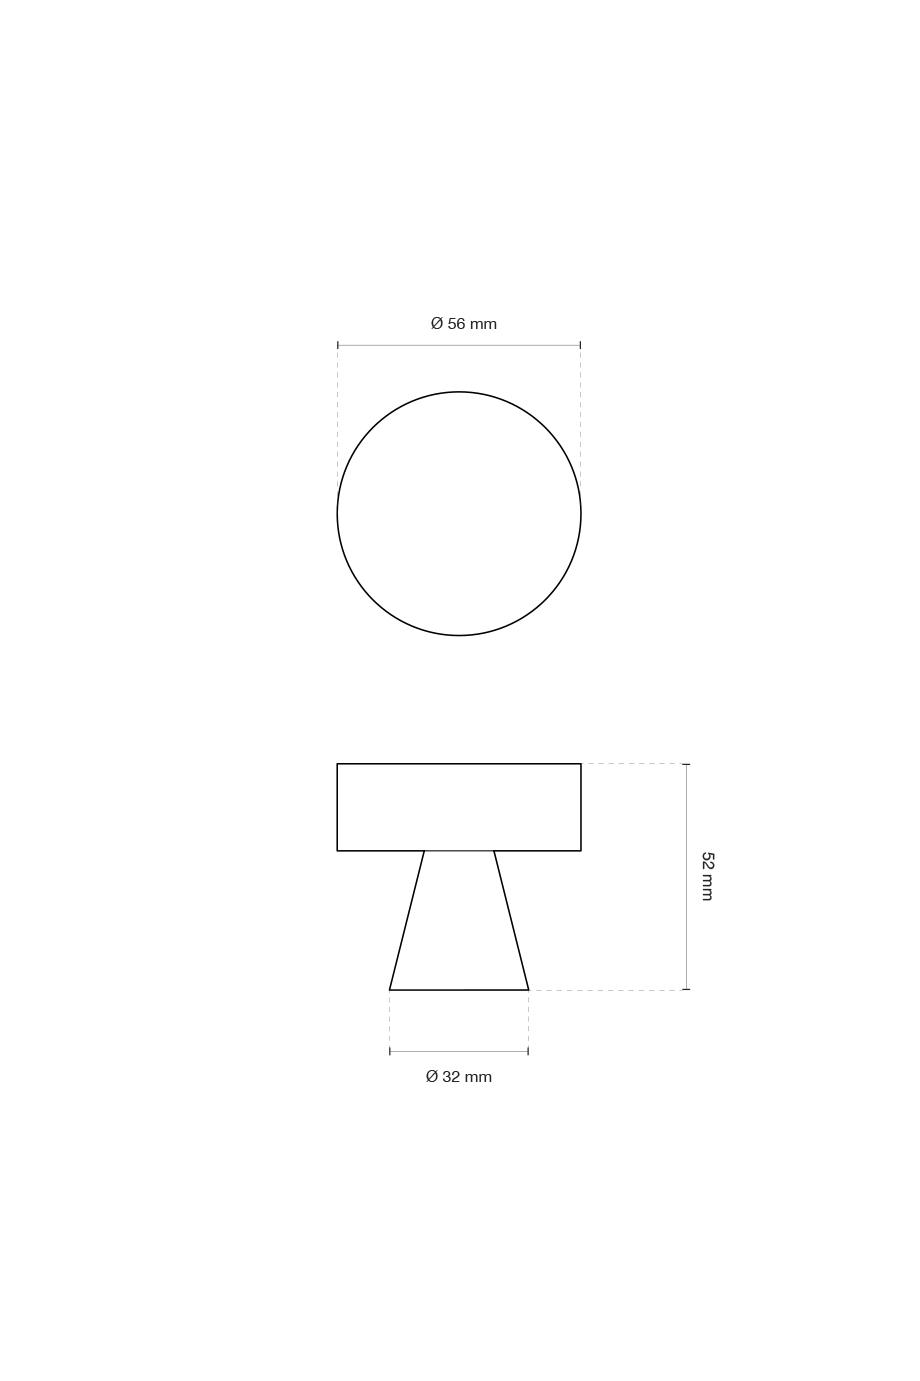 bitpart-dimensions-door knob.jpg